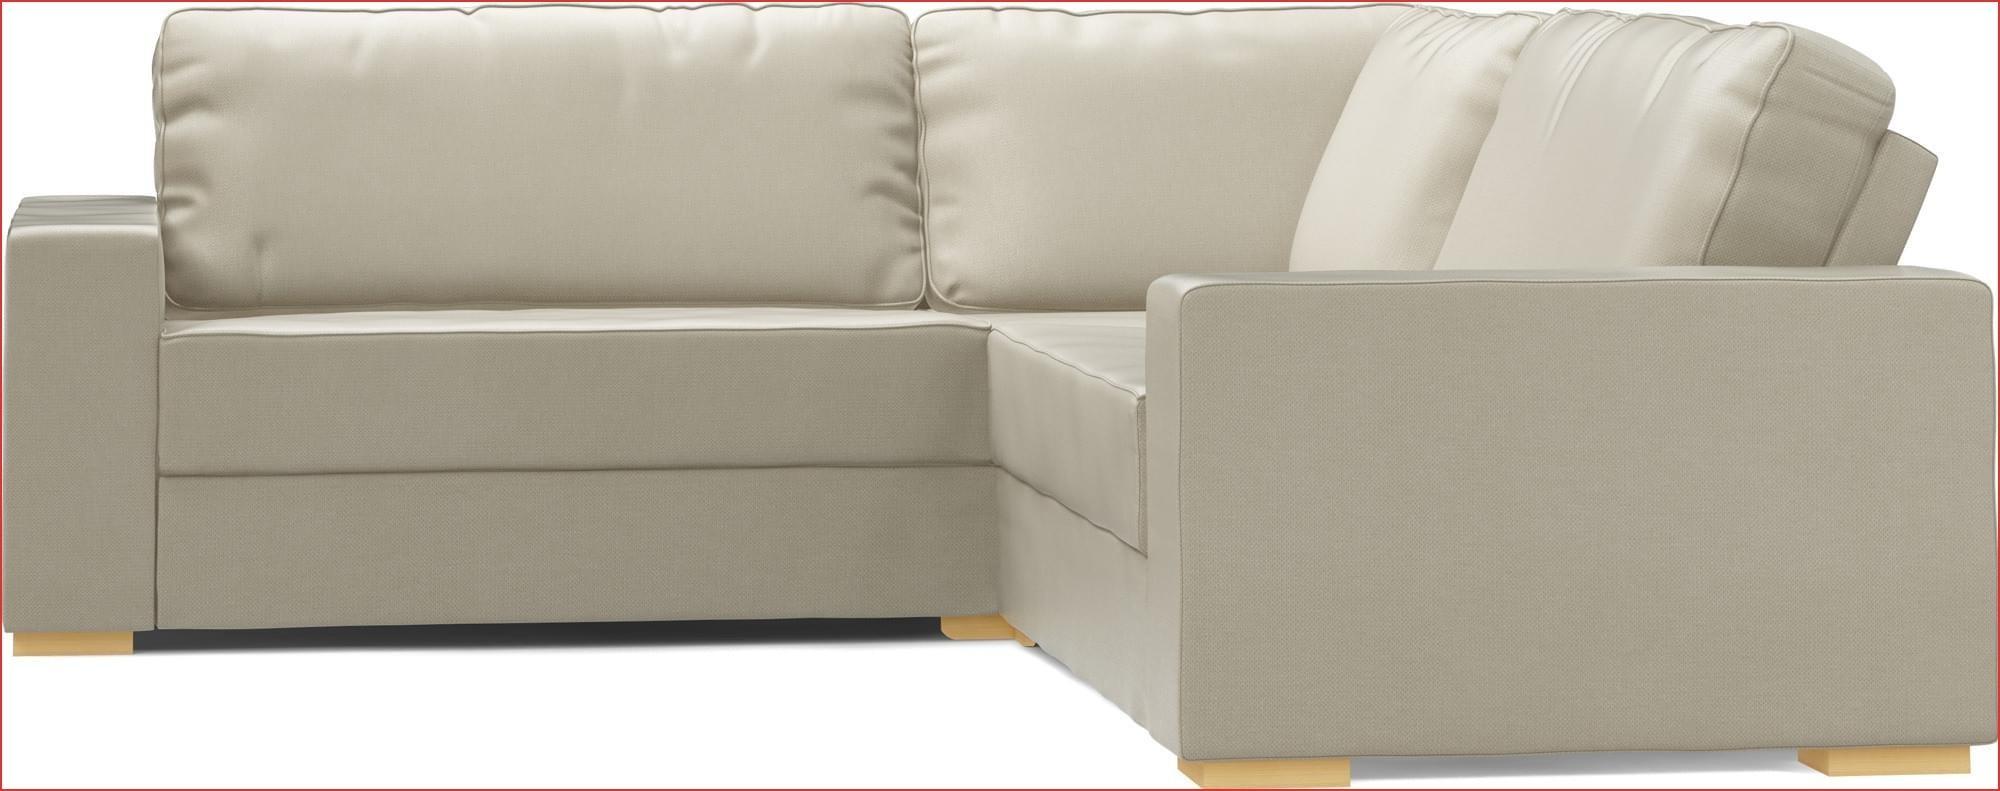 2X2 Corner Sofa Beautiful Xia 2X2 Corner Sofa Custom Made Corner Within 2X2 Corner Sofas (Image 3 of 21)